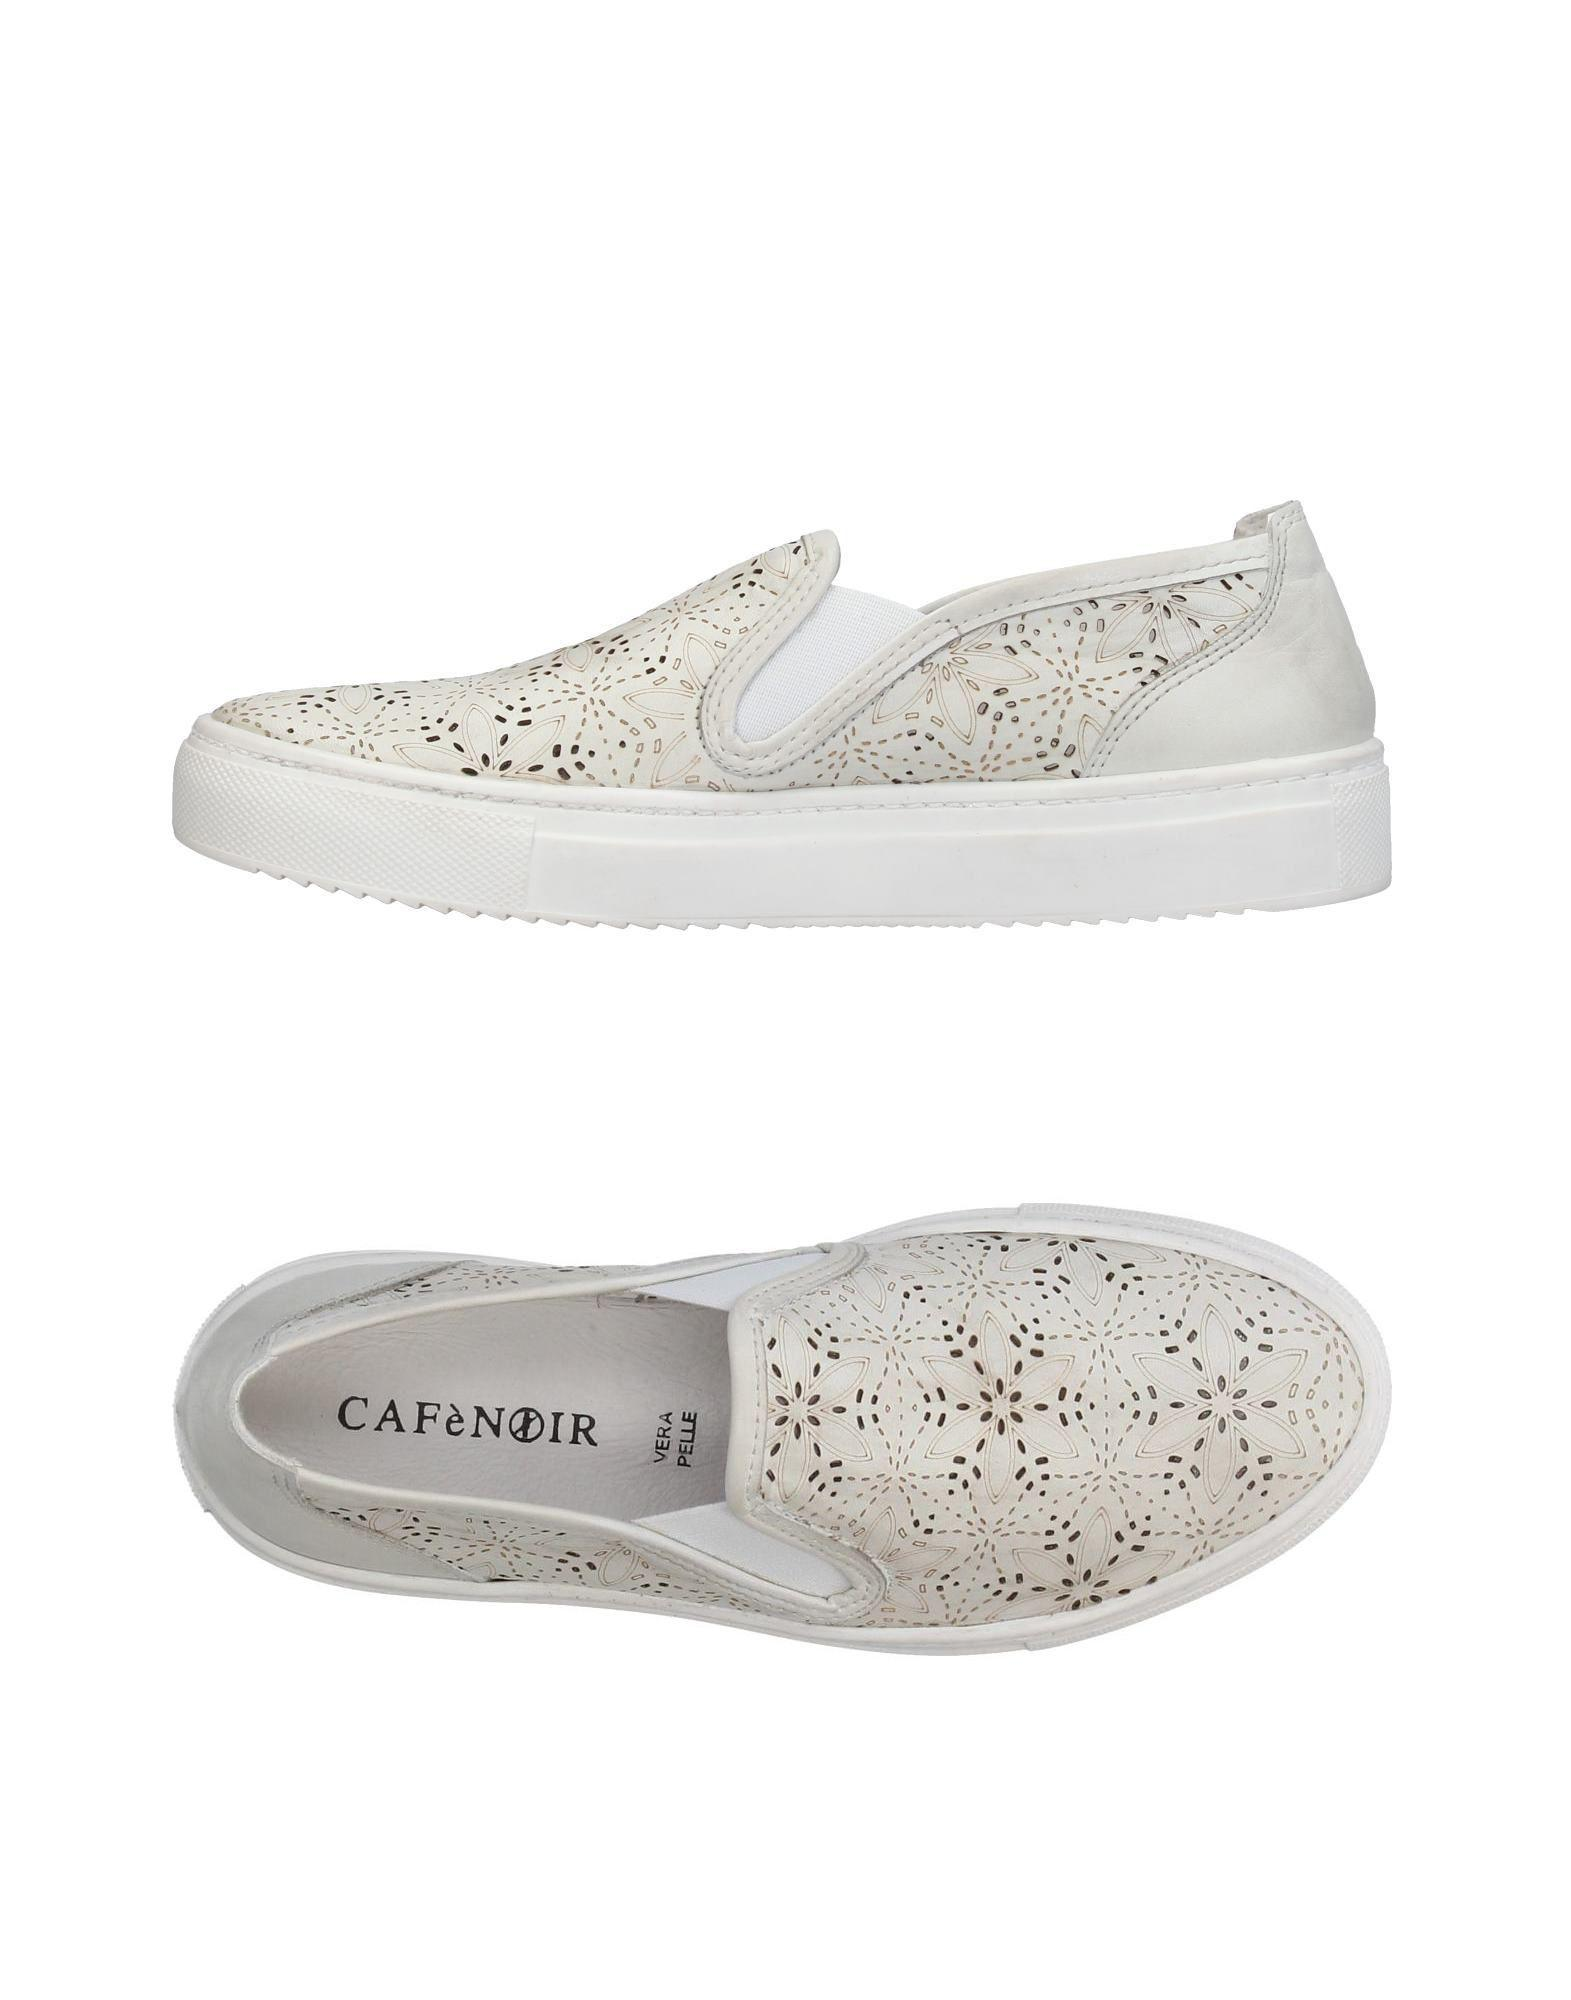 Chaussures - Bas-tops Et Baskets Cafènoir vmlV5ASbQ